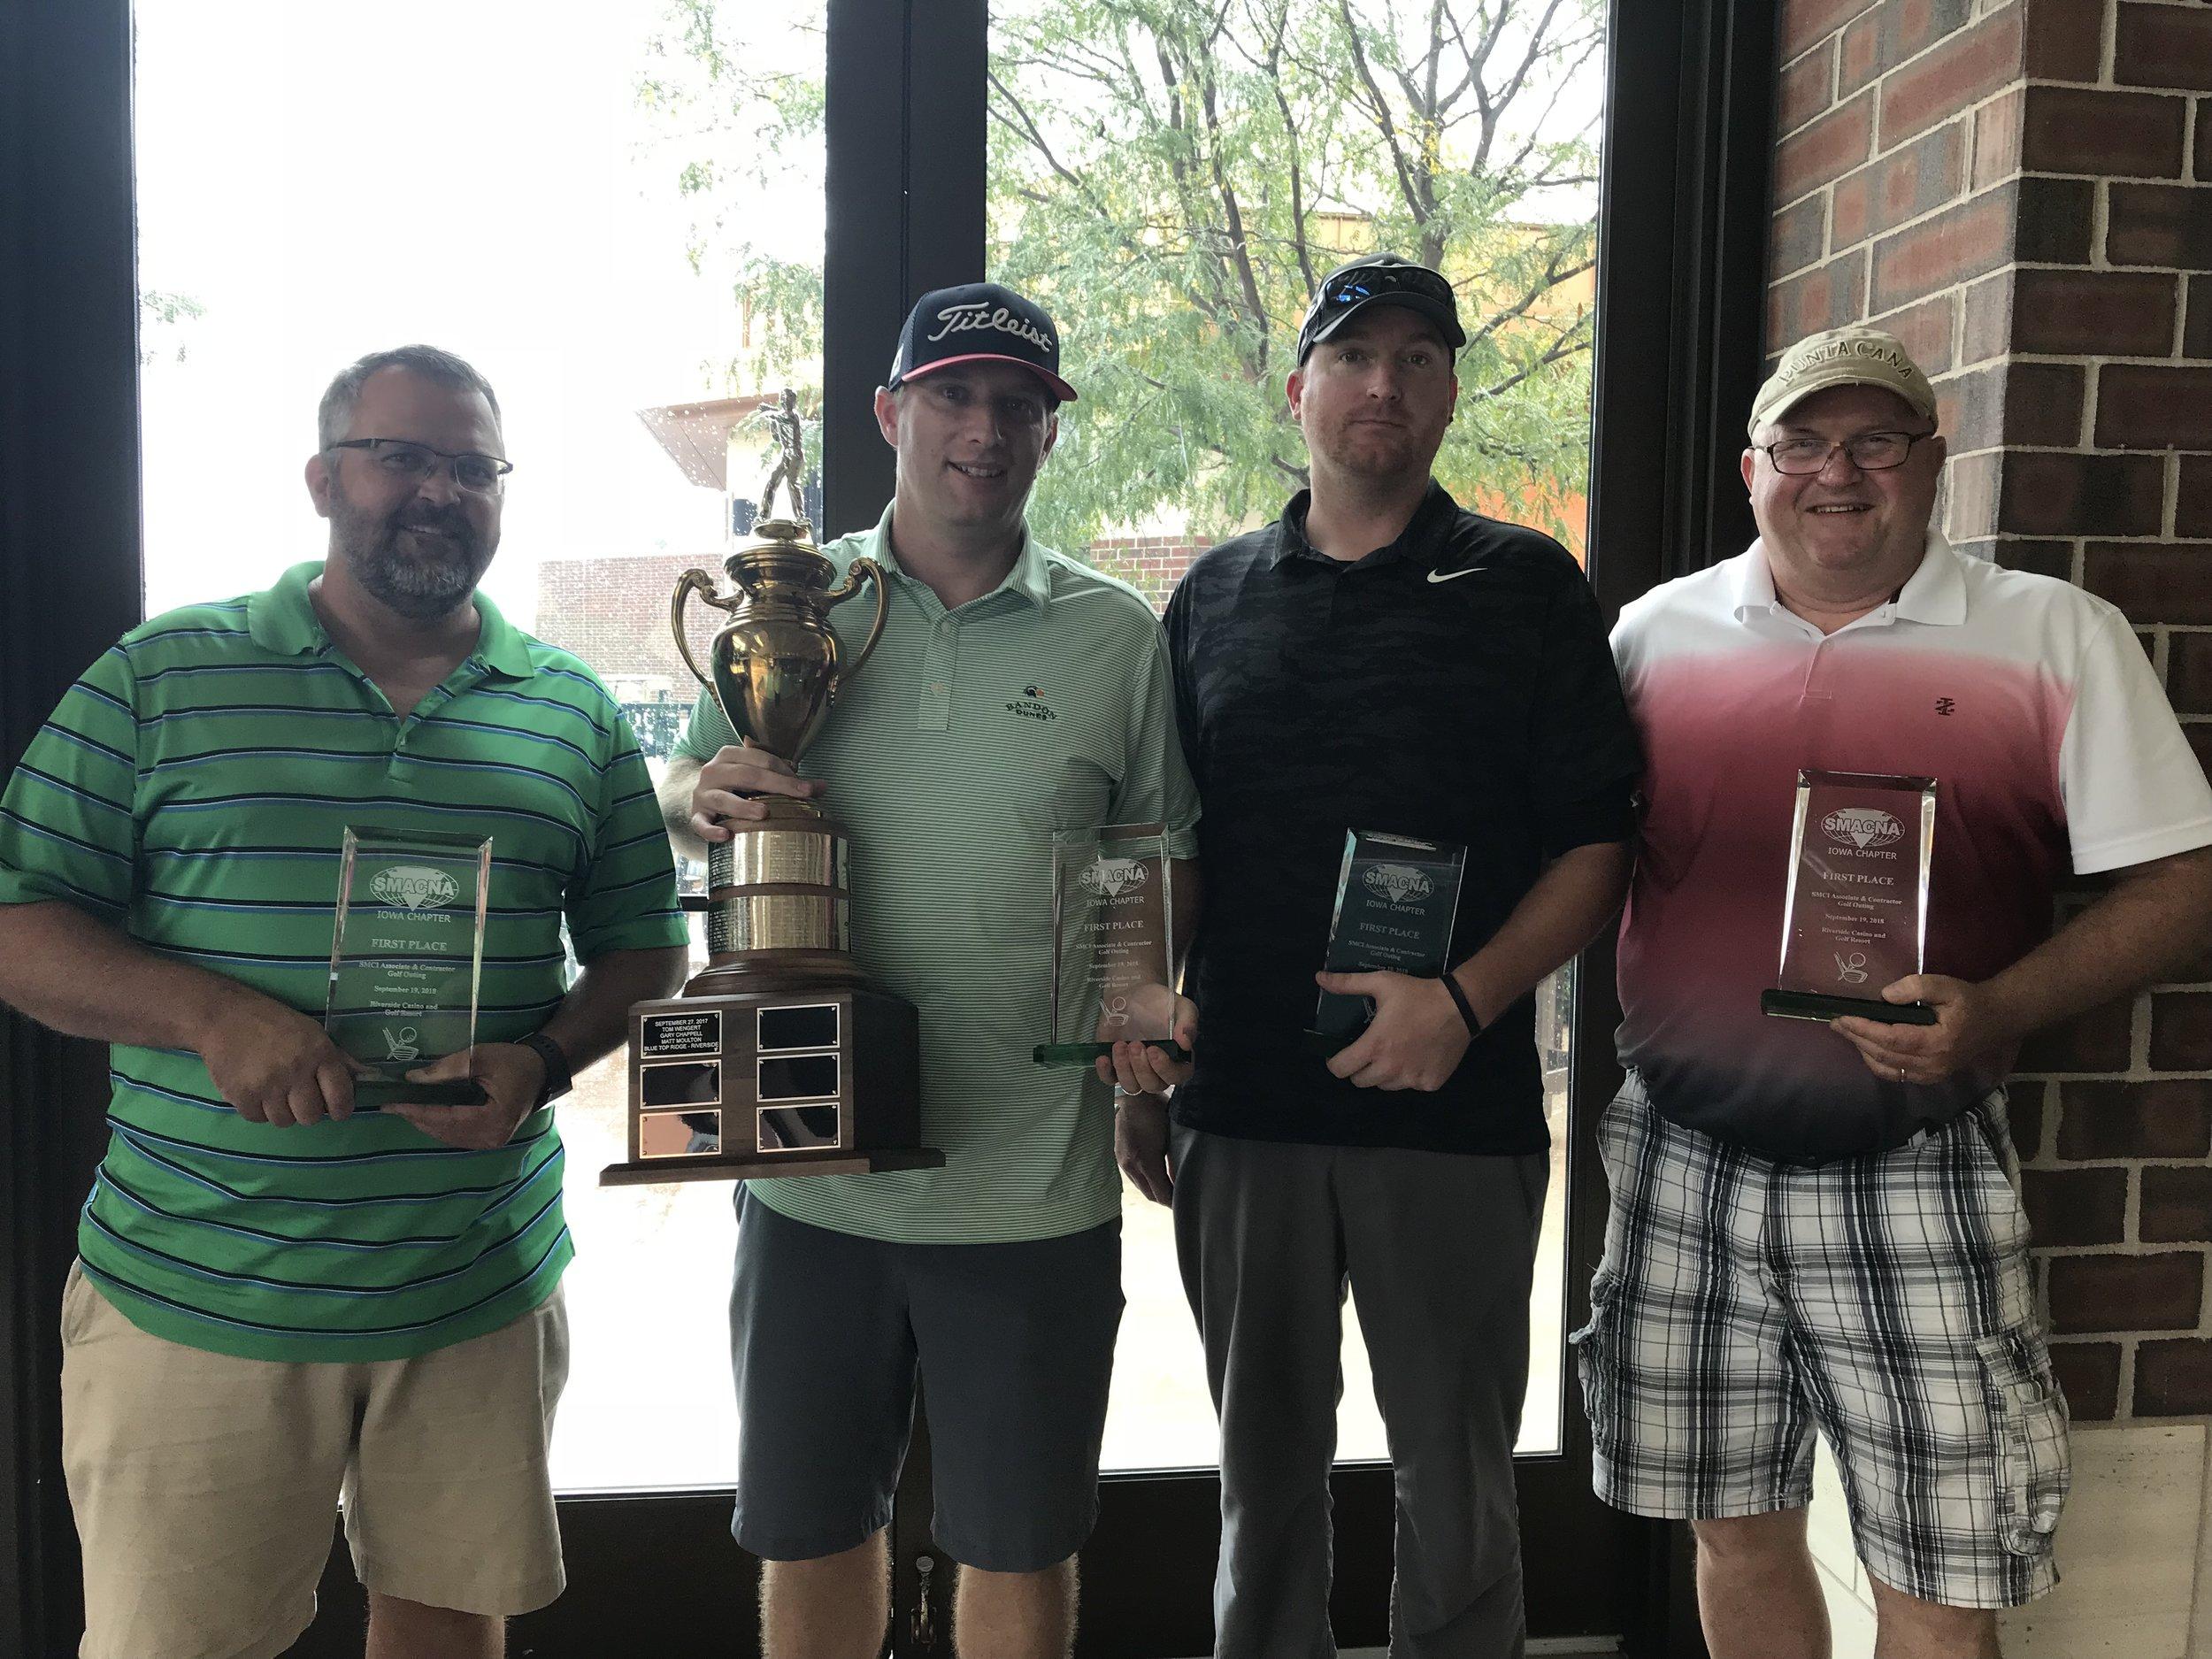 Winners were Jim Kent, Scott Impens, Brandon Snitker and George Grosvenor.